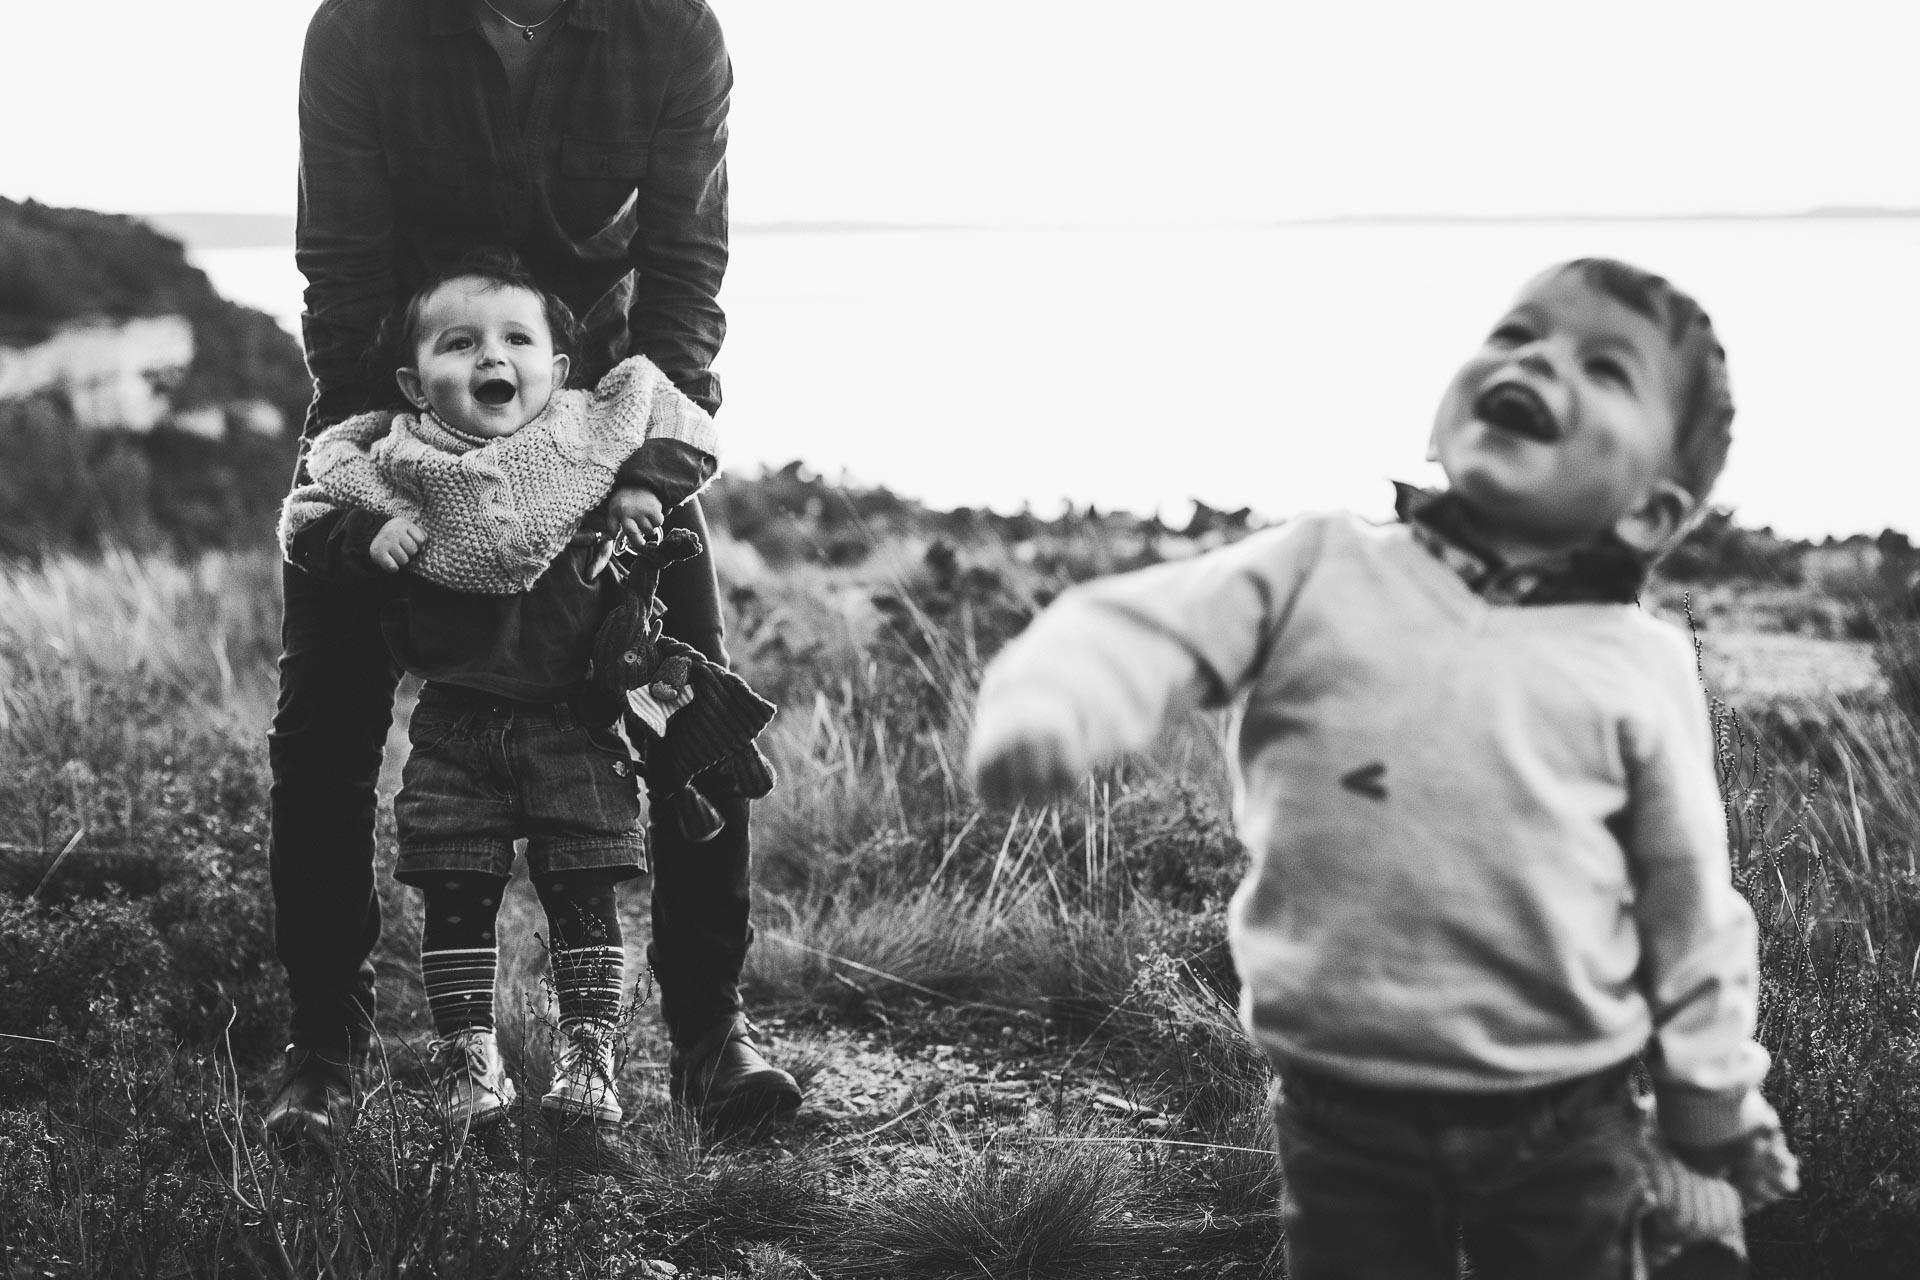 28-les enfants rigolent